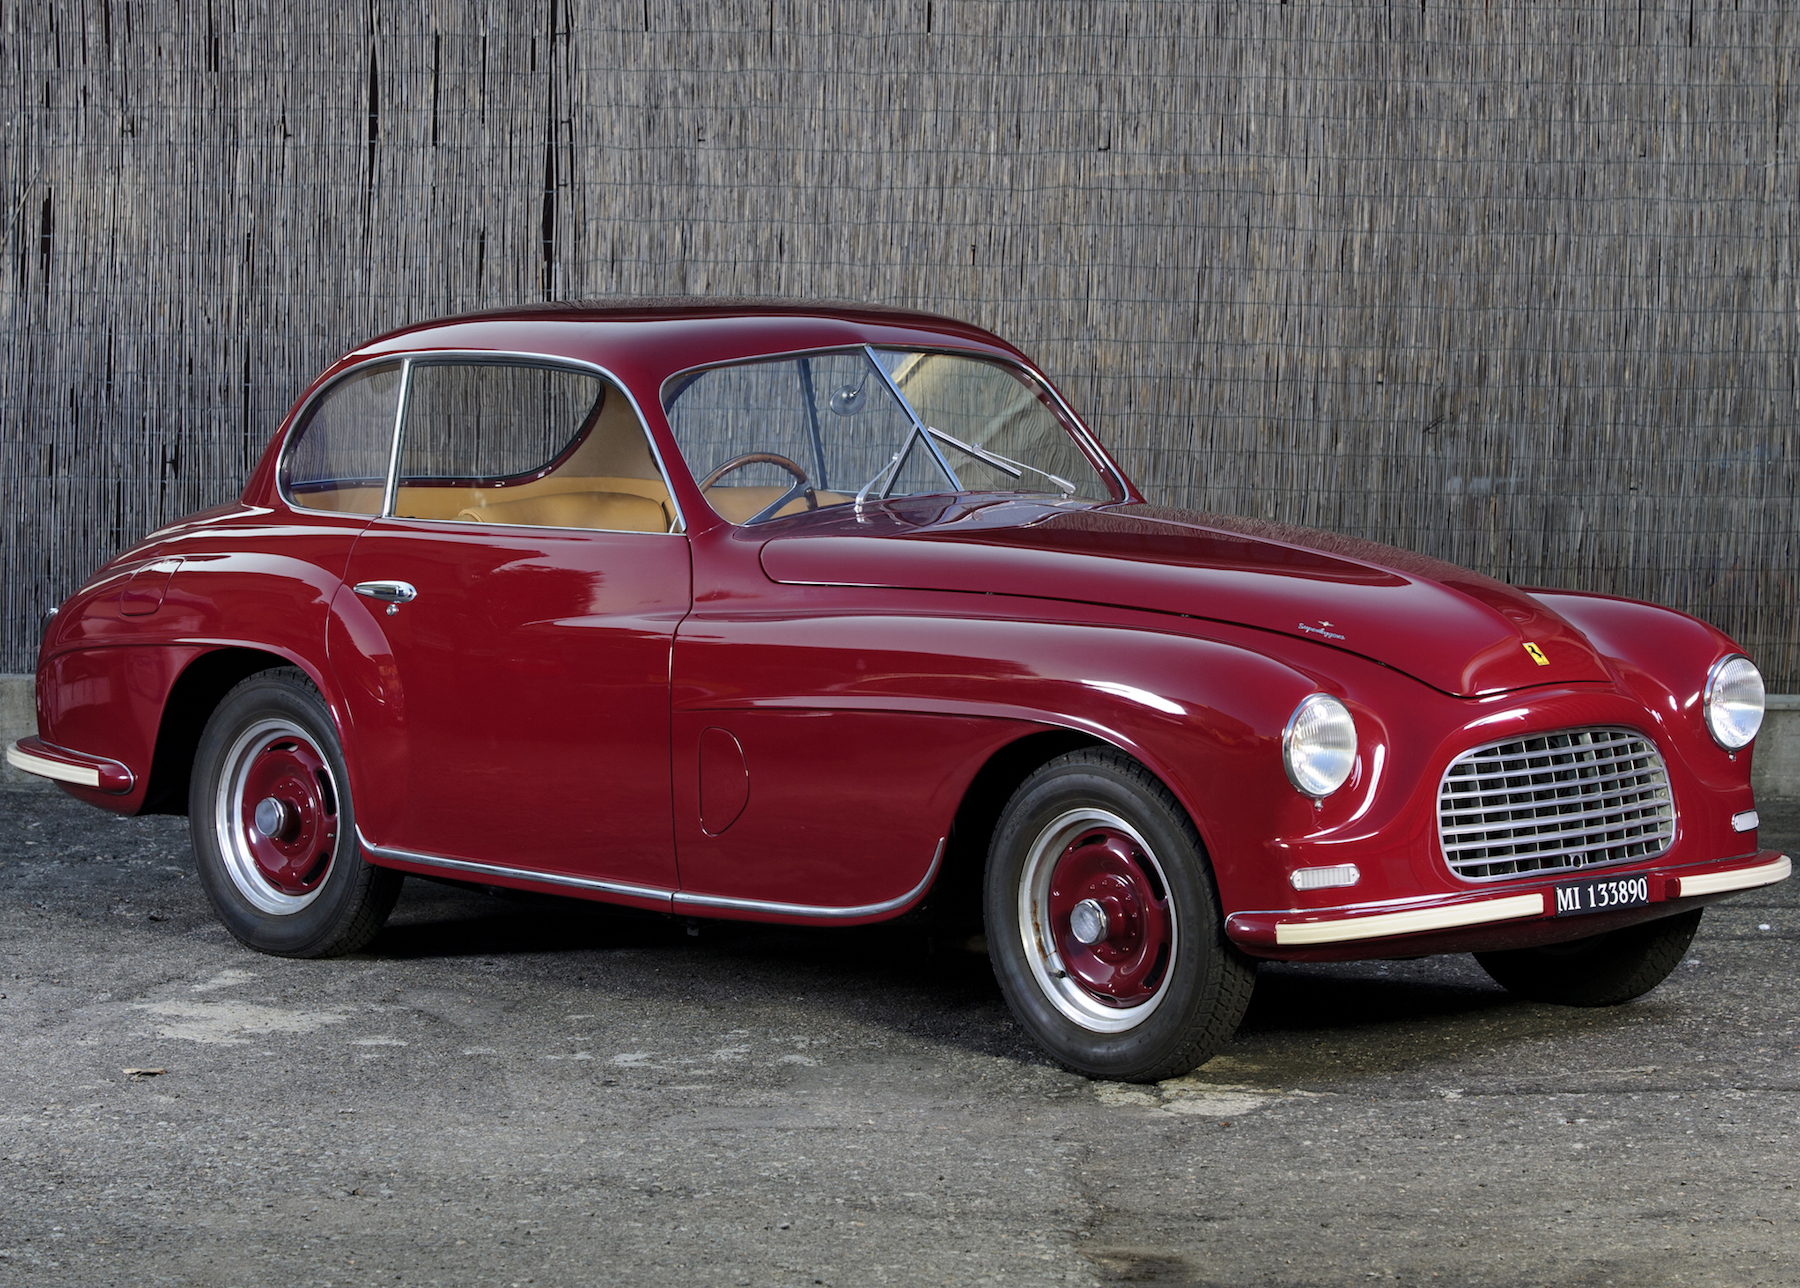 Ferrari 166 Inter (1948-1950)